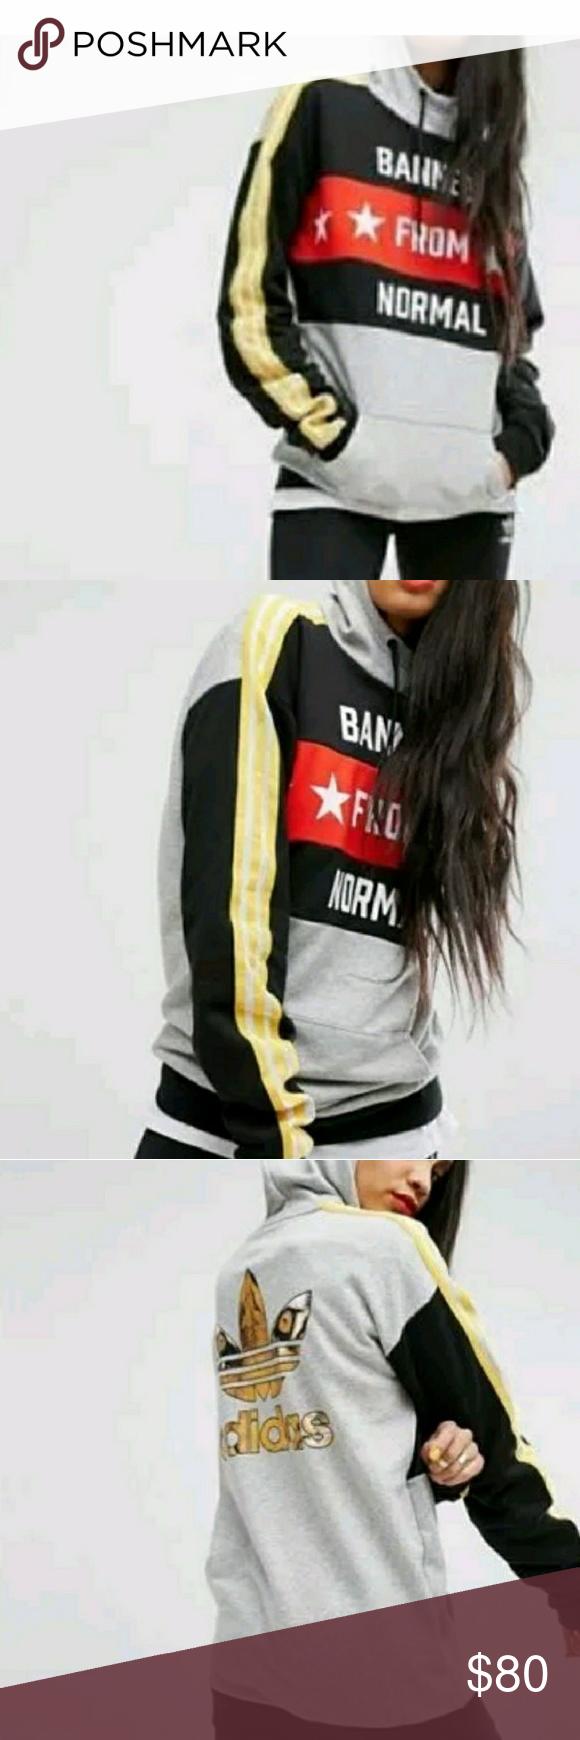 5d7ea49981 Adidas Banned From Normal Sweatshirt Rita Ora